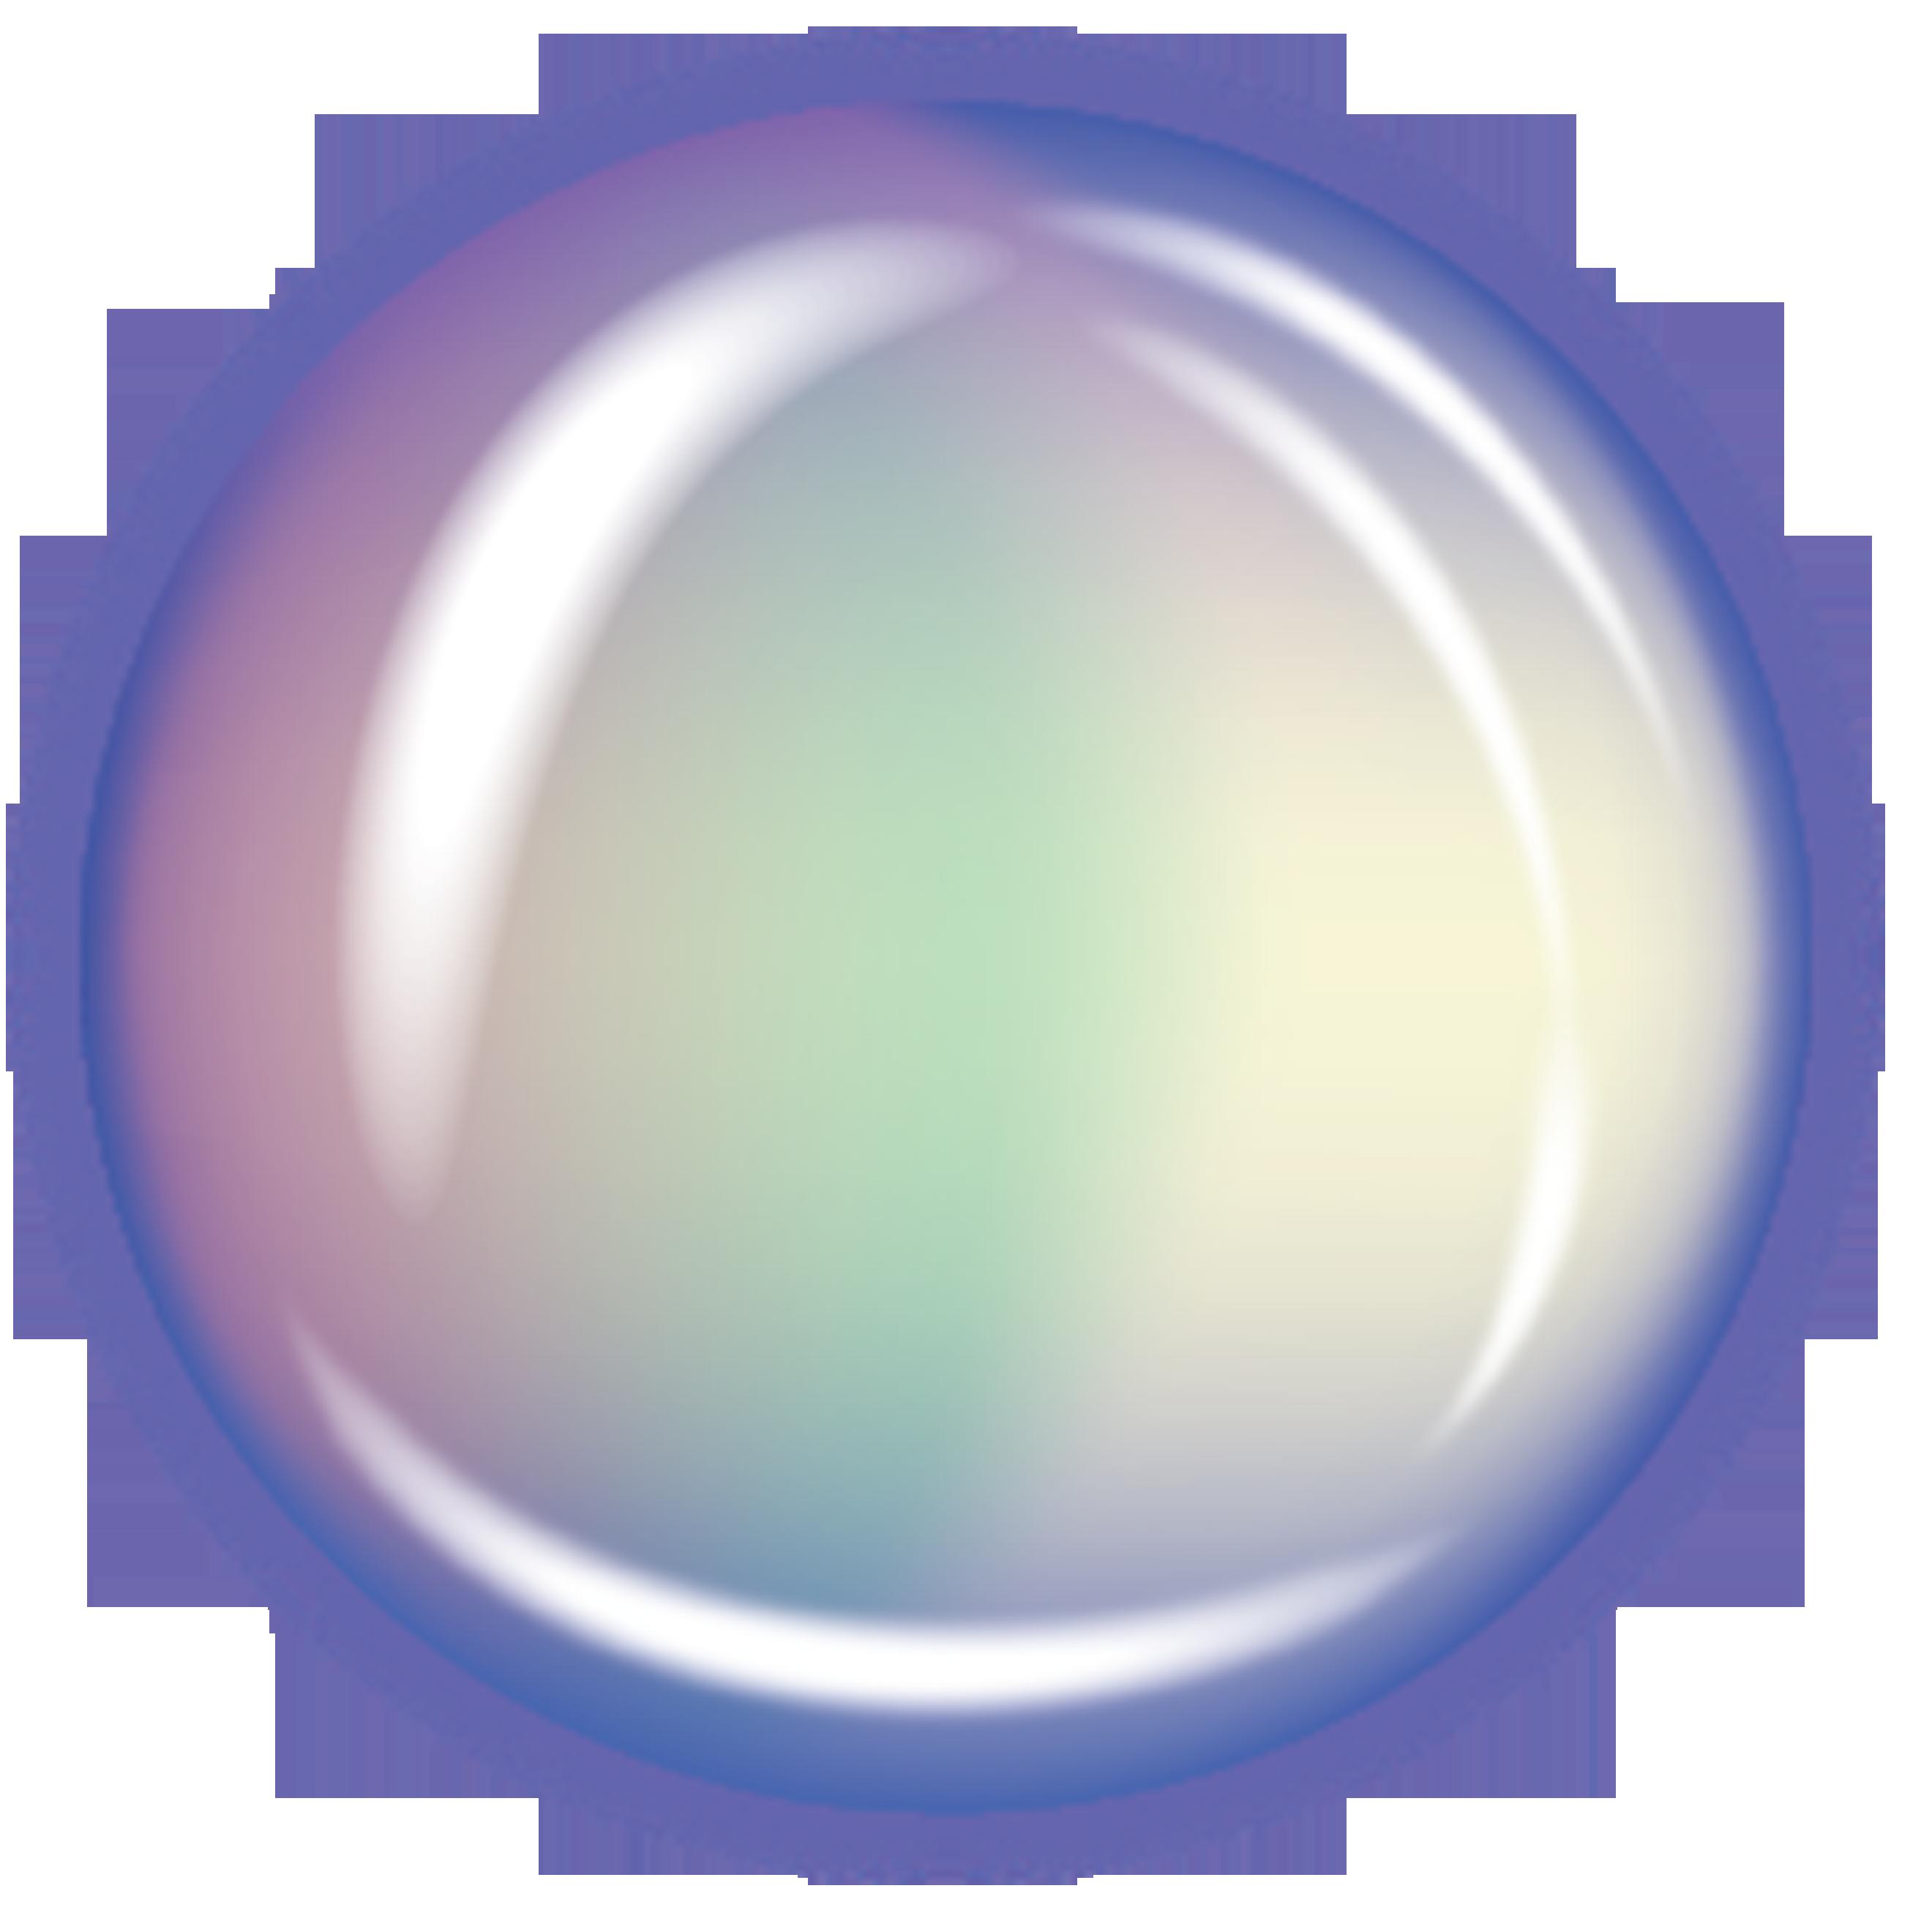 Transparent bubble clip art. Creation clipart may